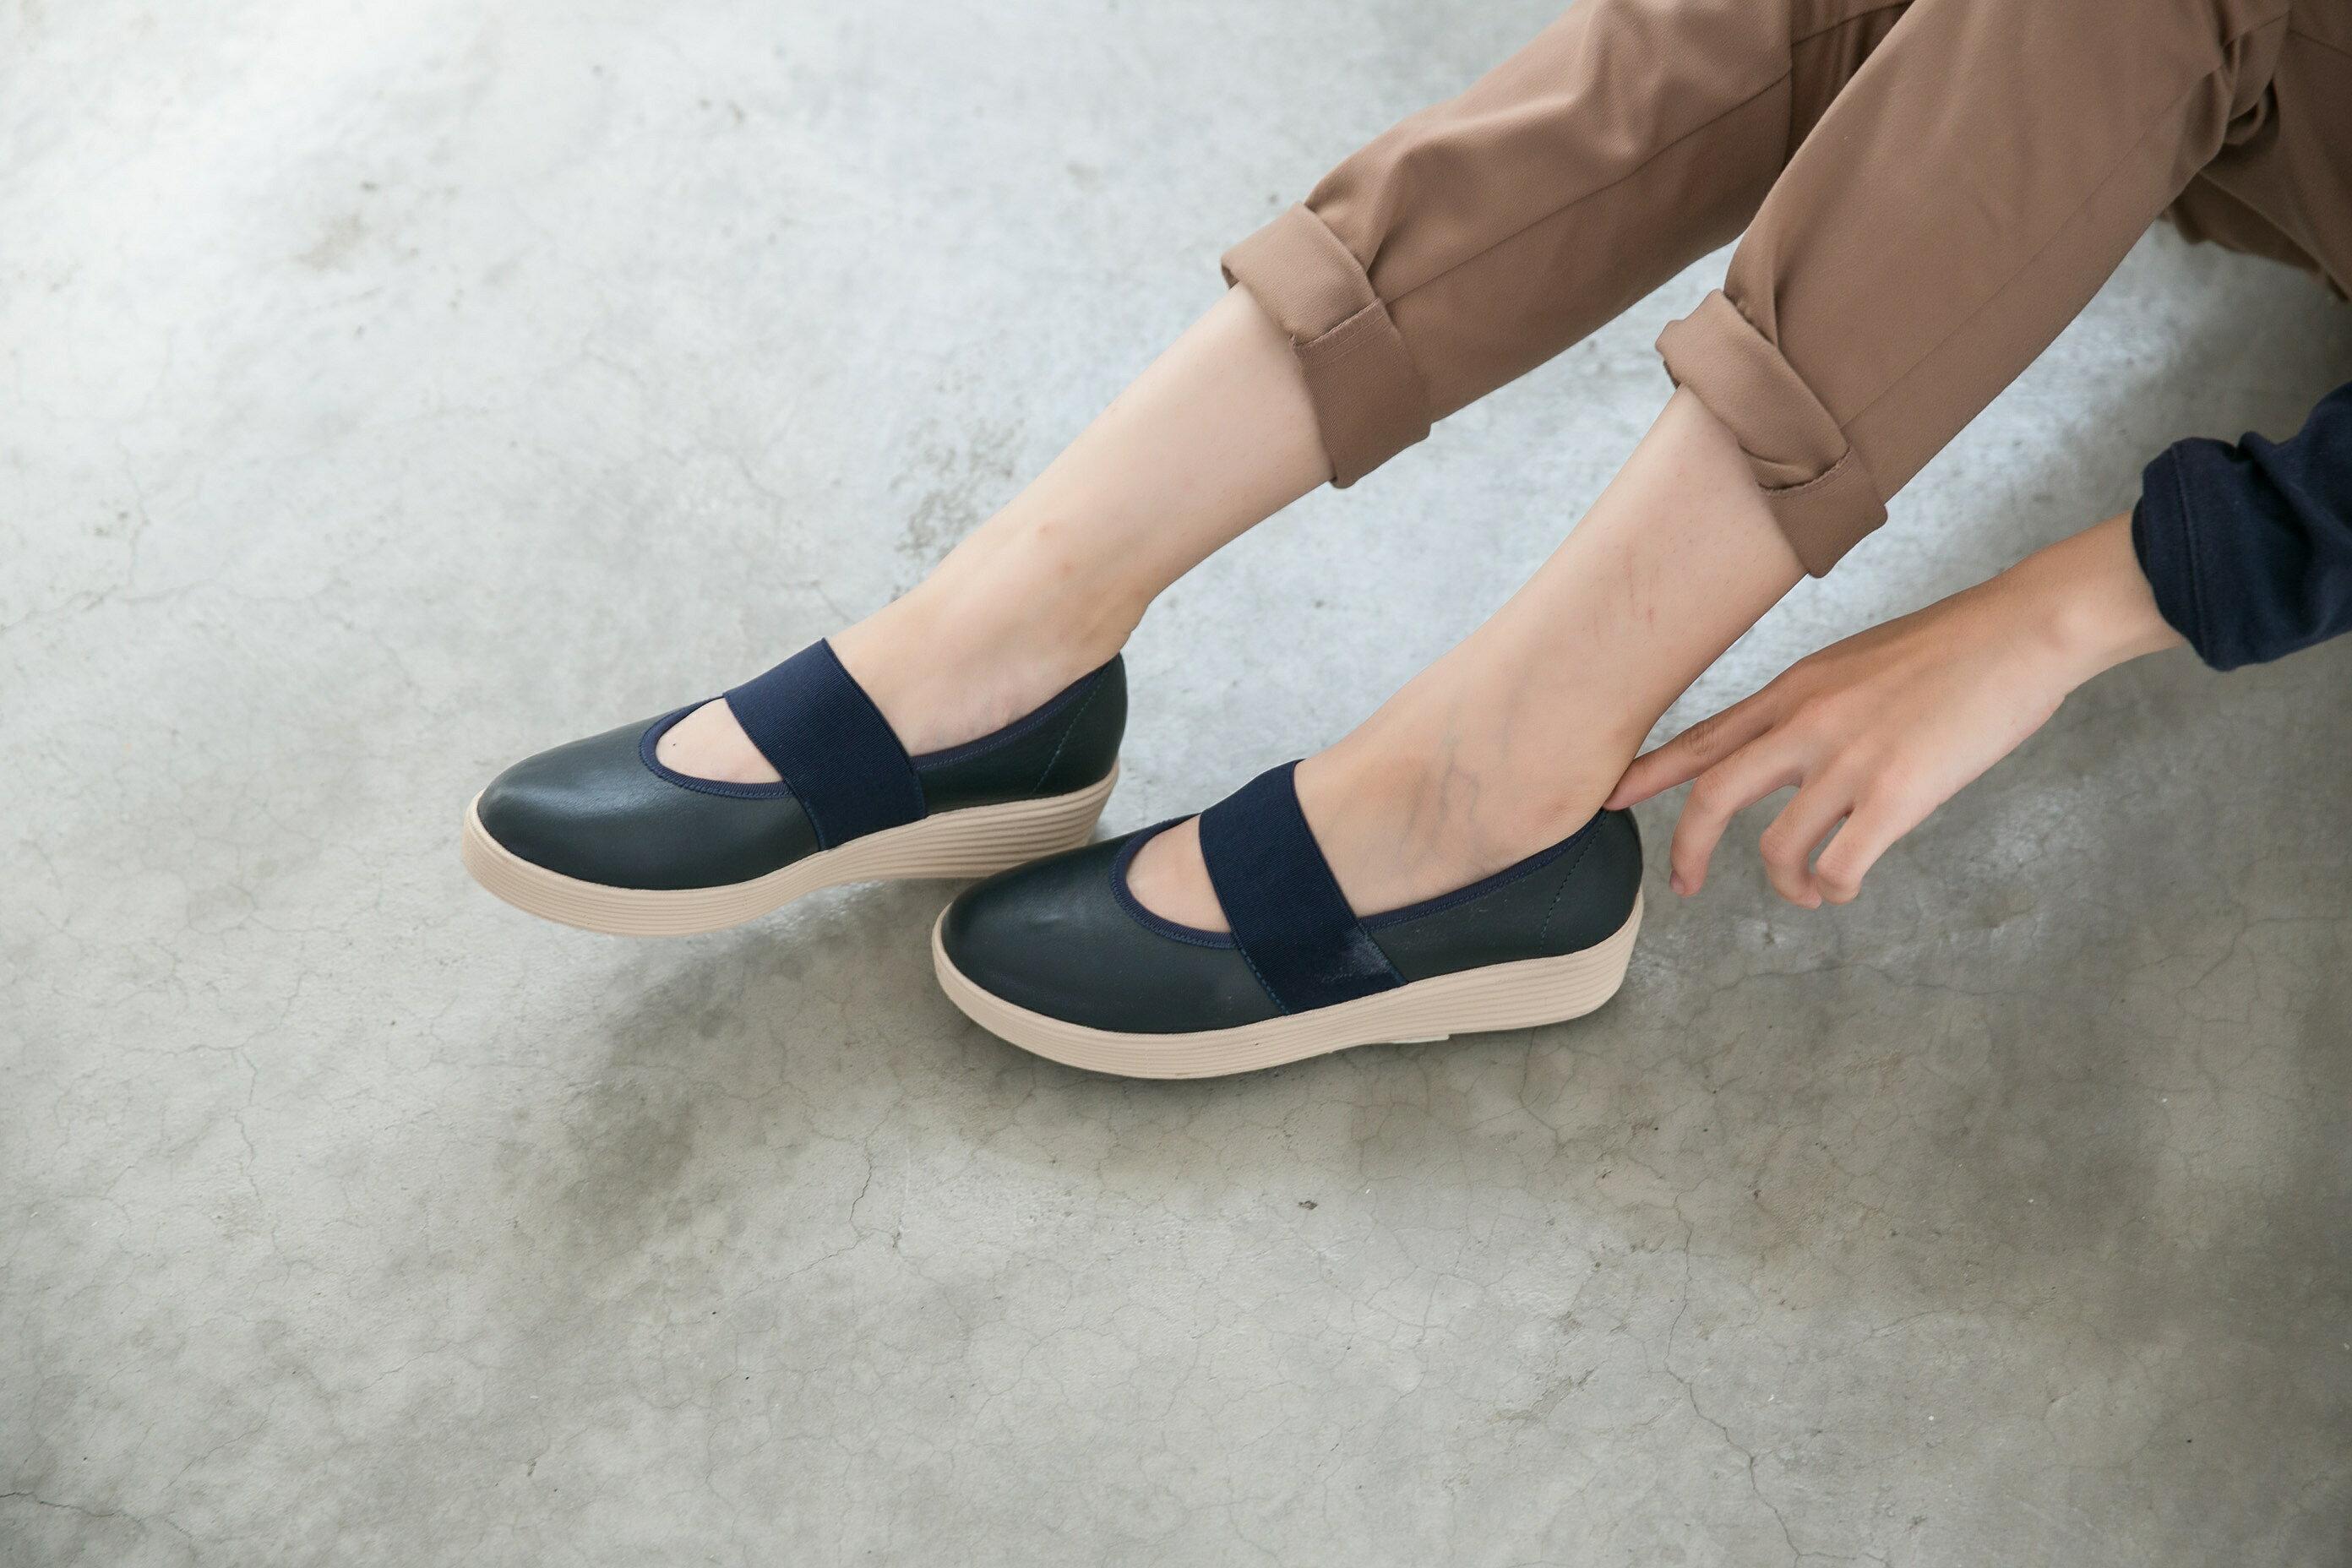 Aimez La Vie 超輕氣墊鞋|圓頭鬆緊帶厚牛皮休閒鞋 0